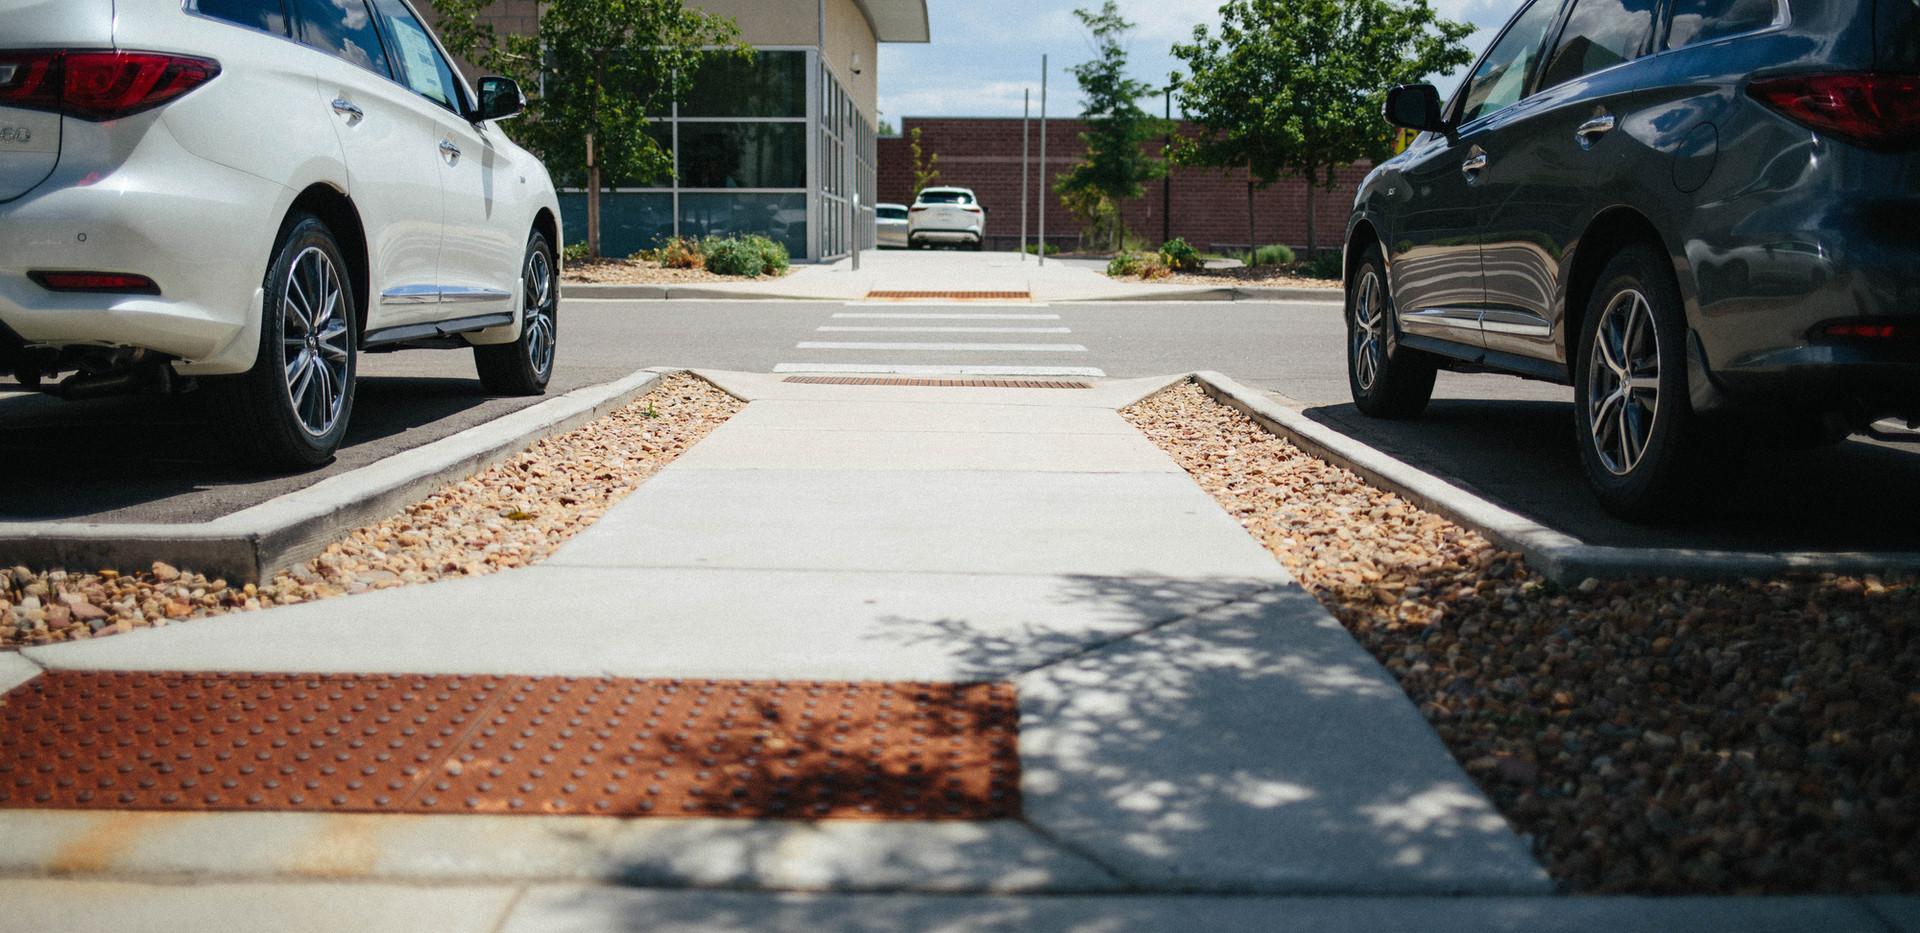 sidewalk, curb, and walkway